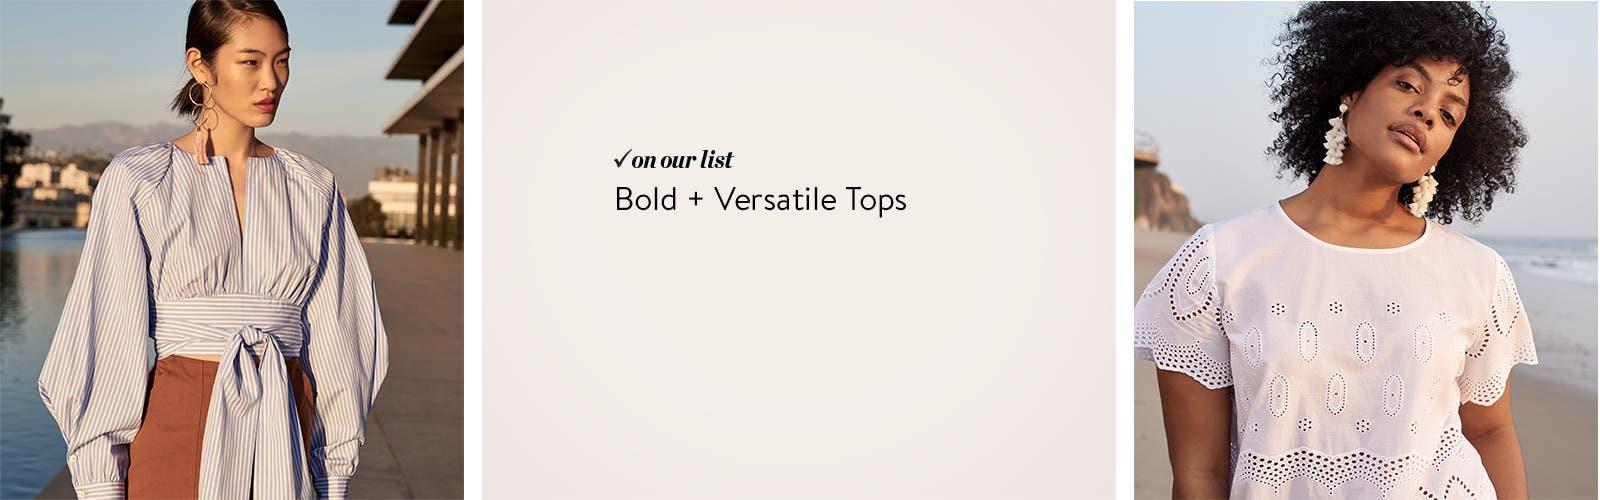 Bold + versatile tops.